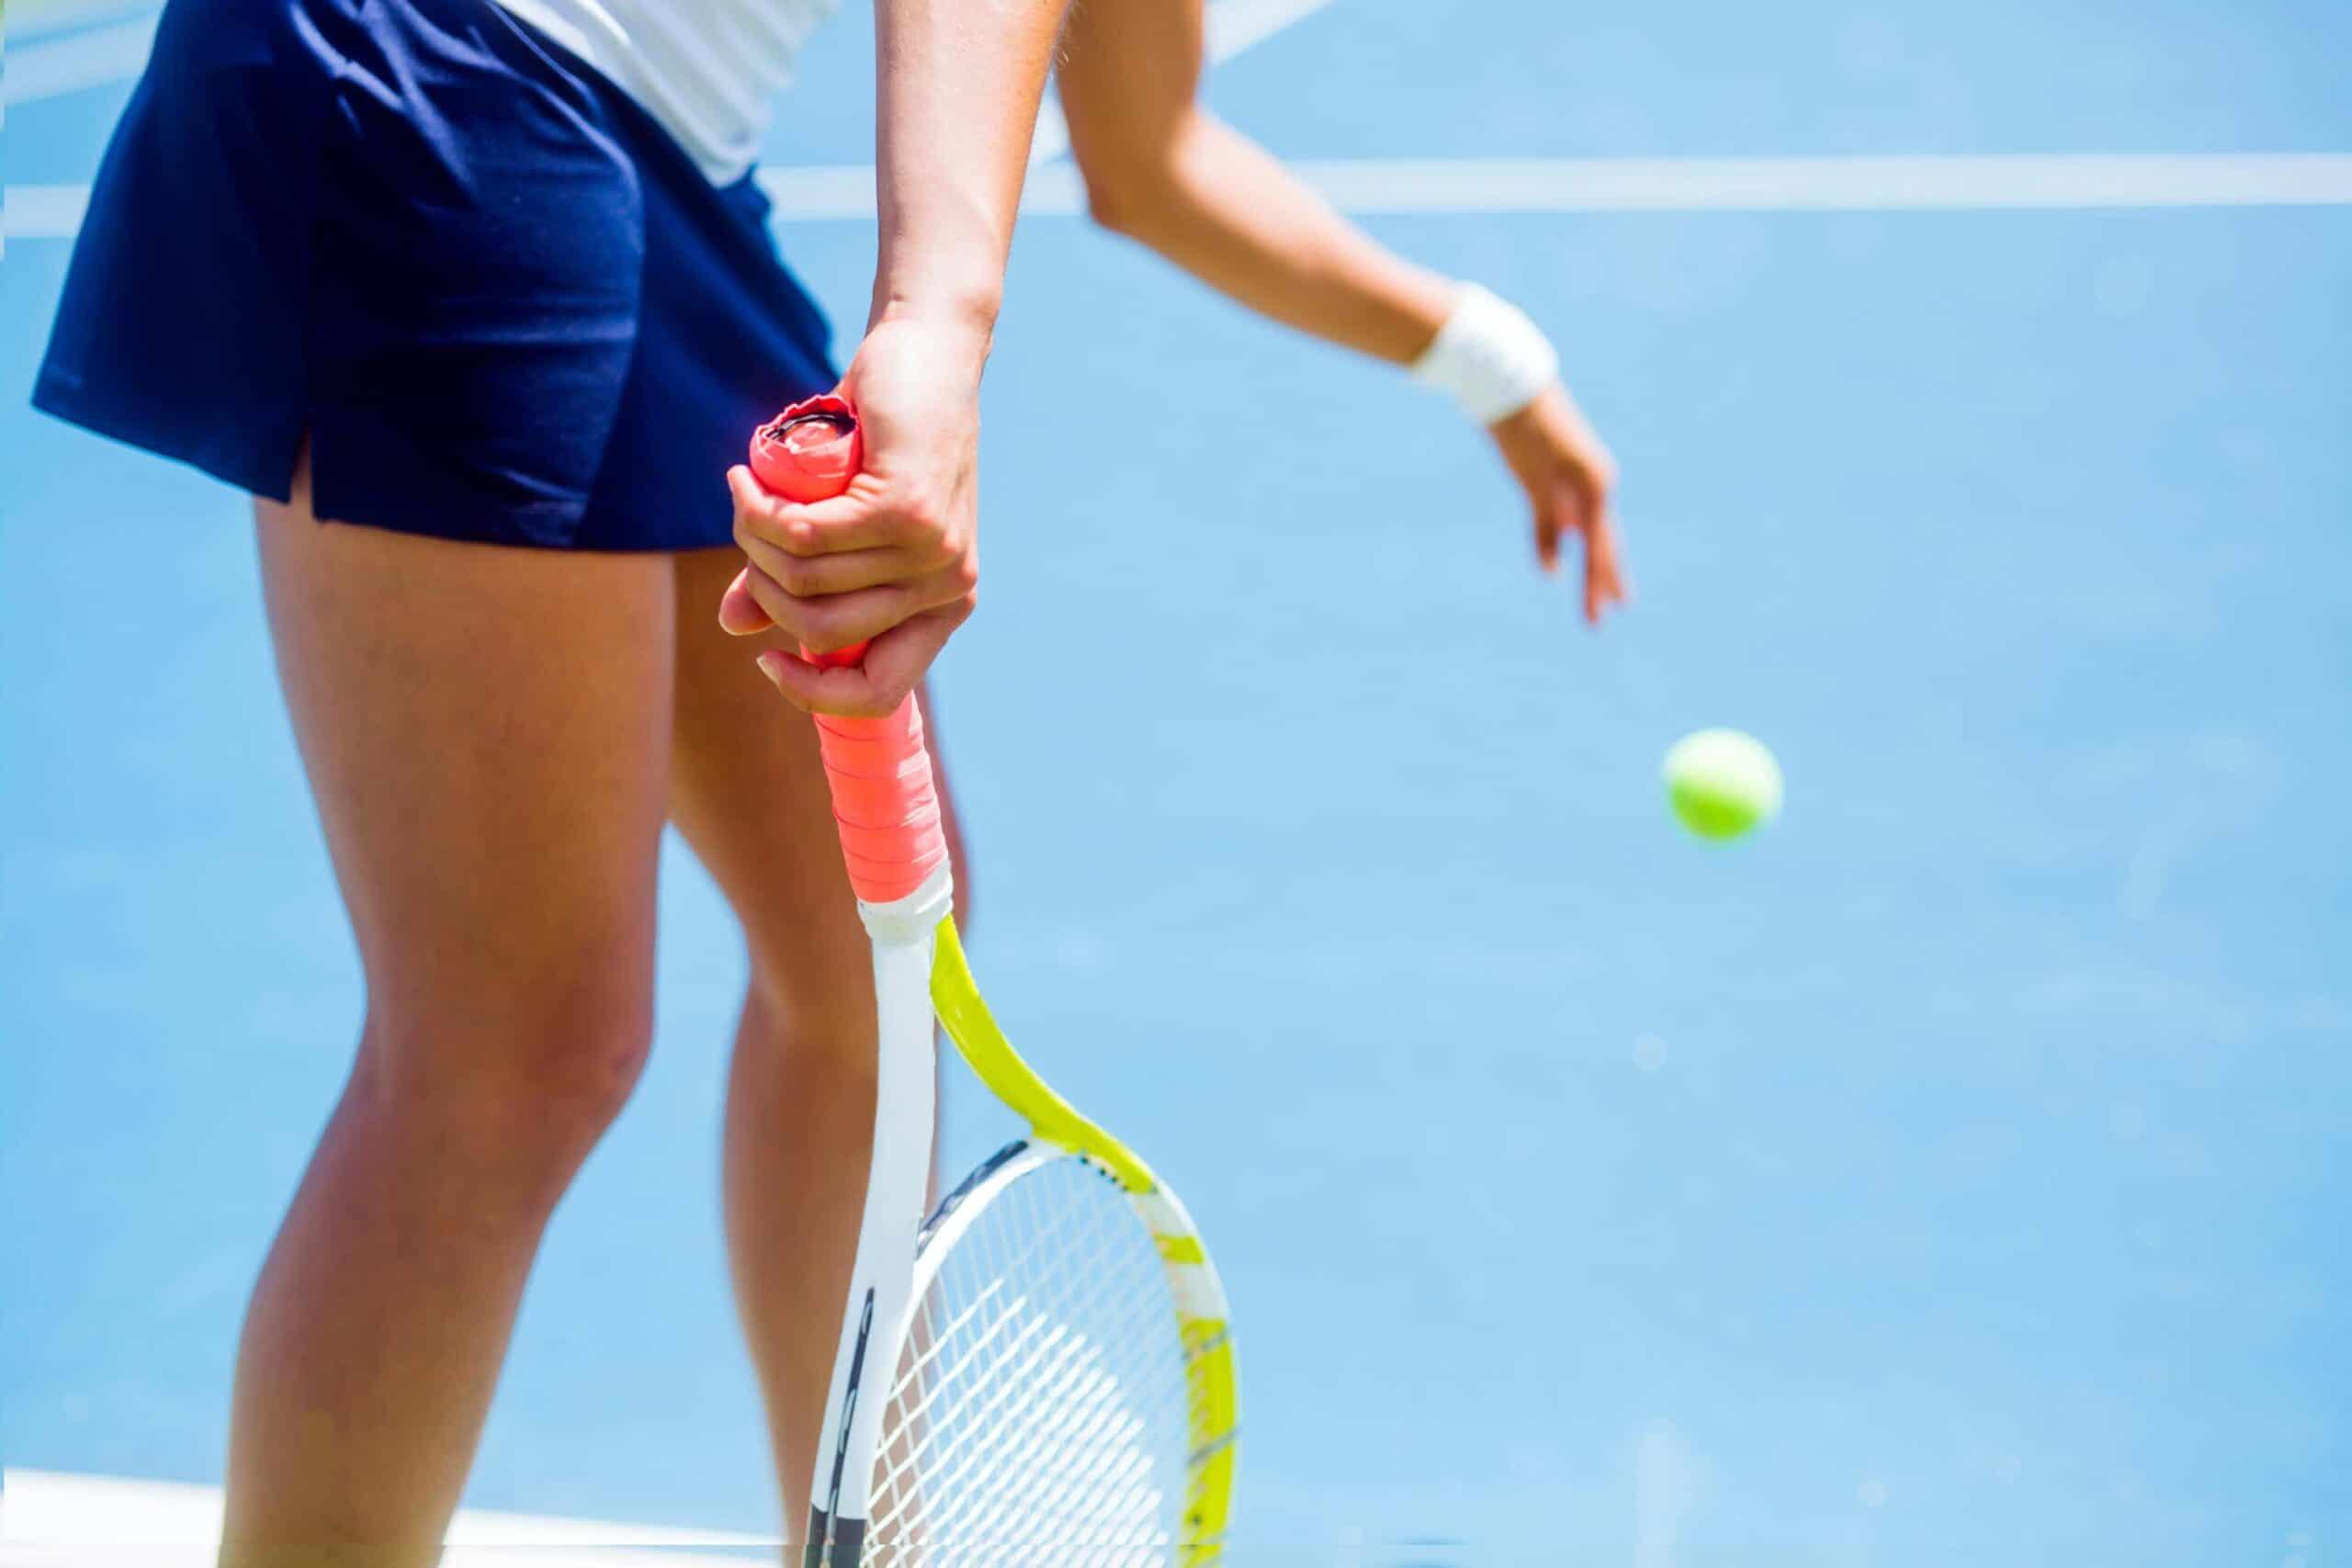 Improving Your Tennis Skills